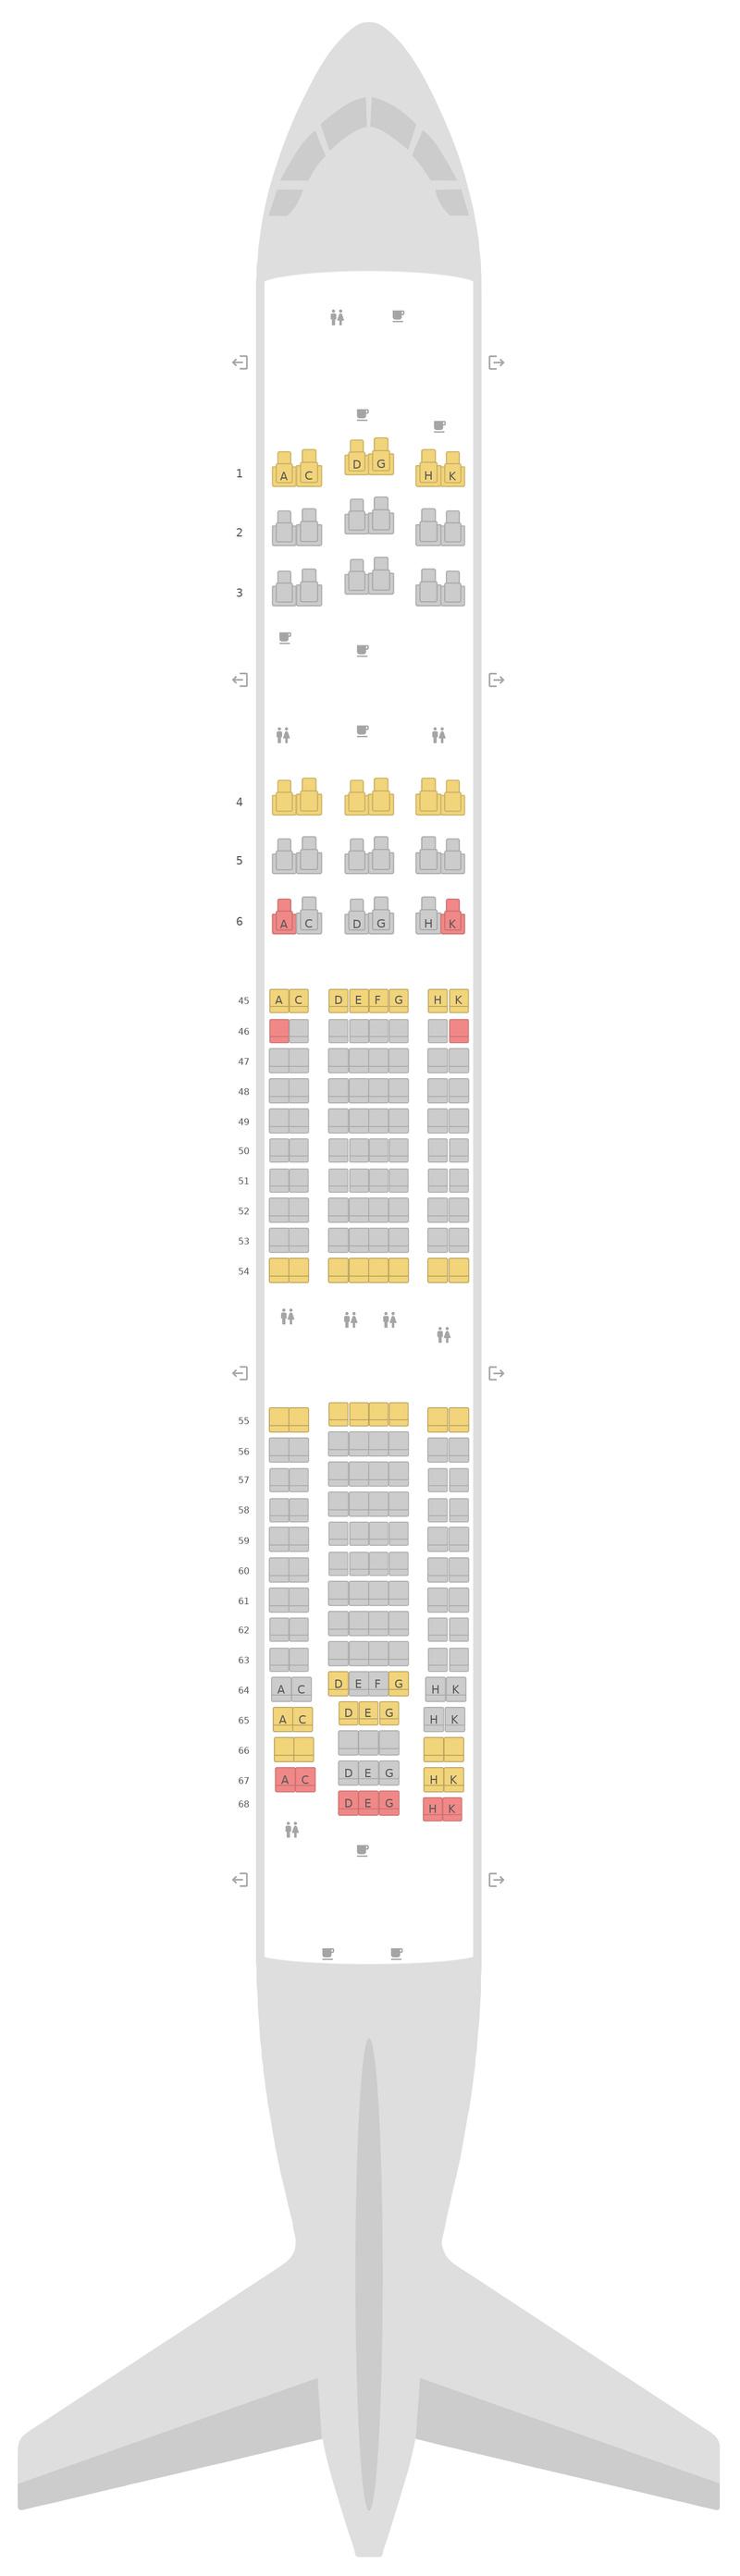 Mapa de asientos Airbus A330-200 (332) South African Airways